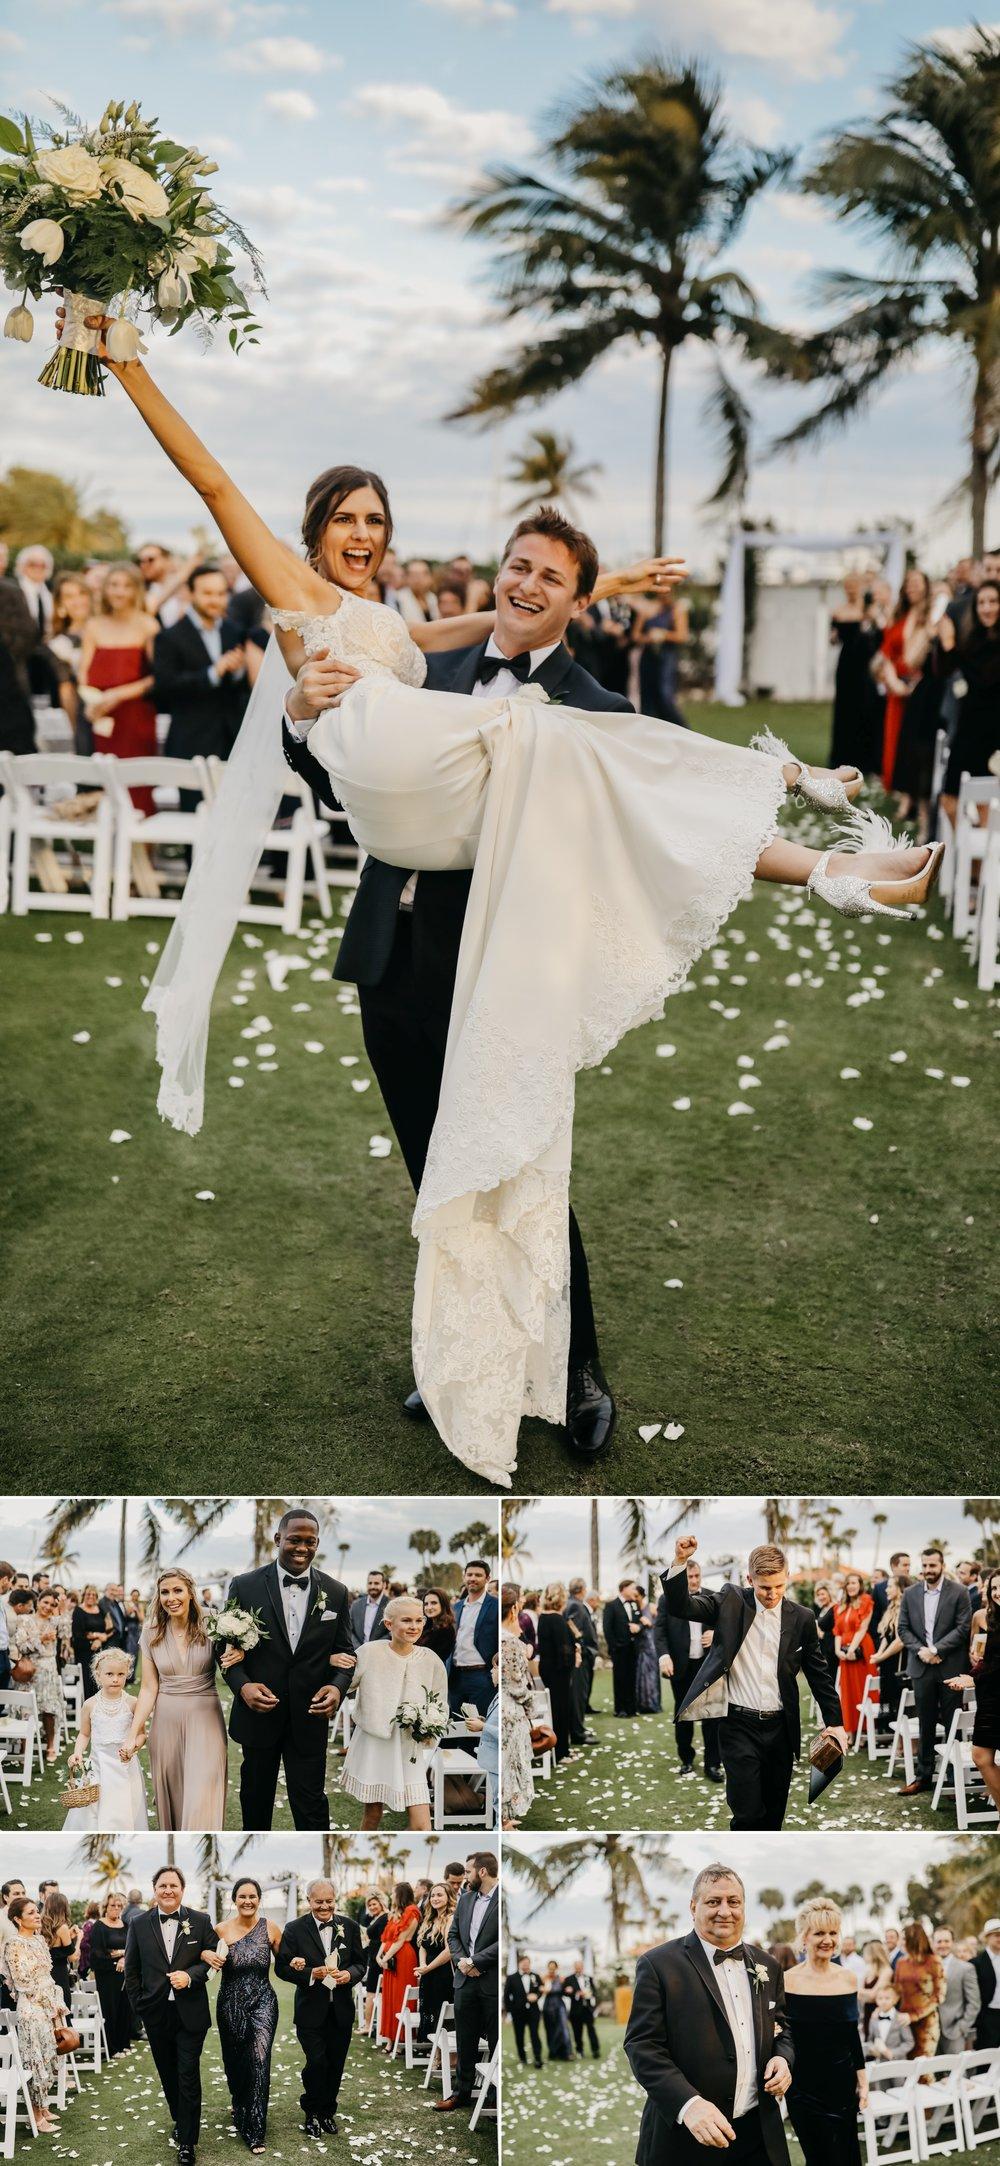 Luxe_tropical_travel_destination_wedding_photography_ShainaDeCiryan.com18.jpg